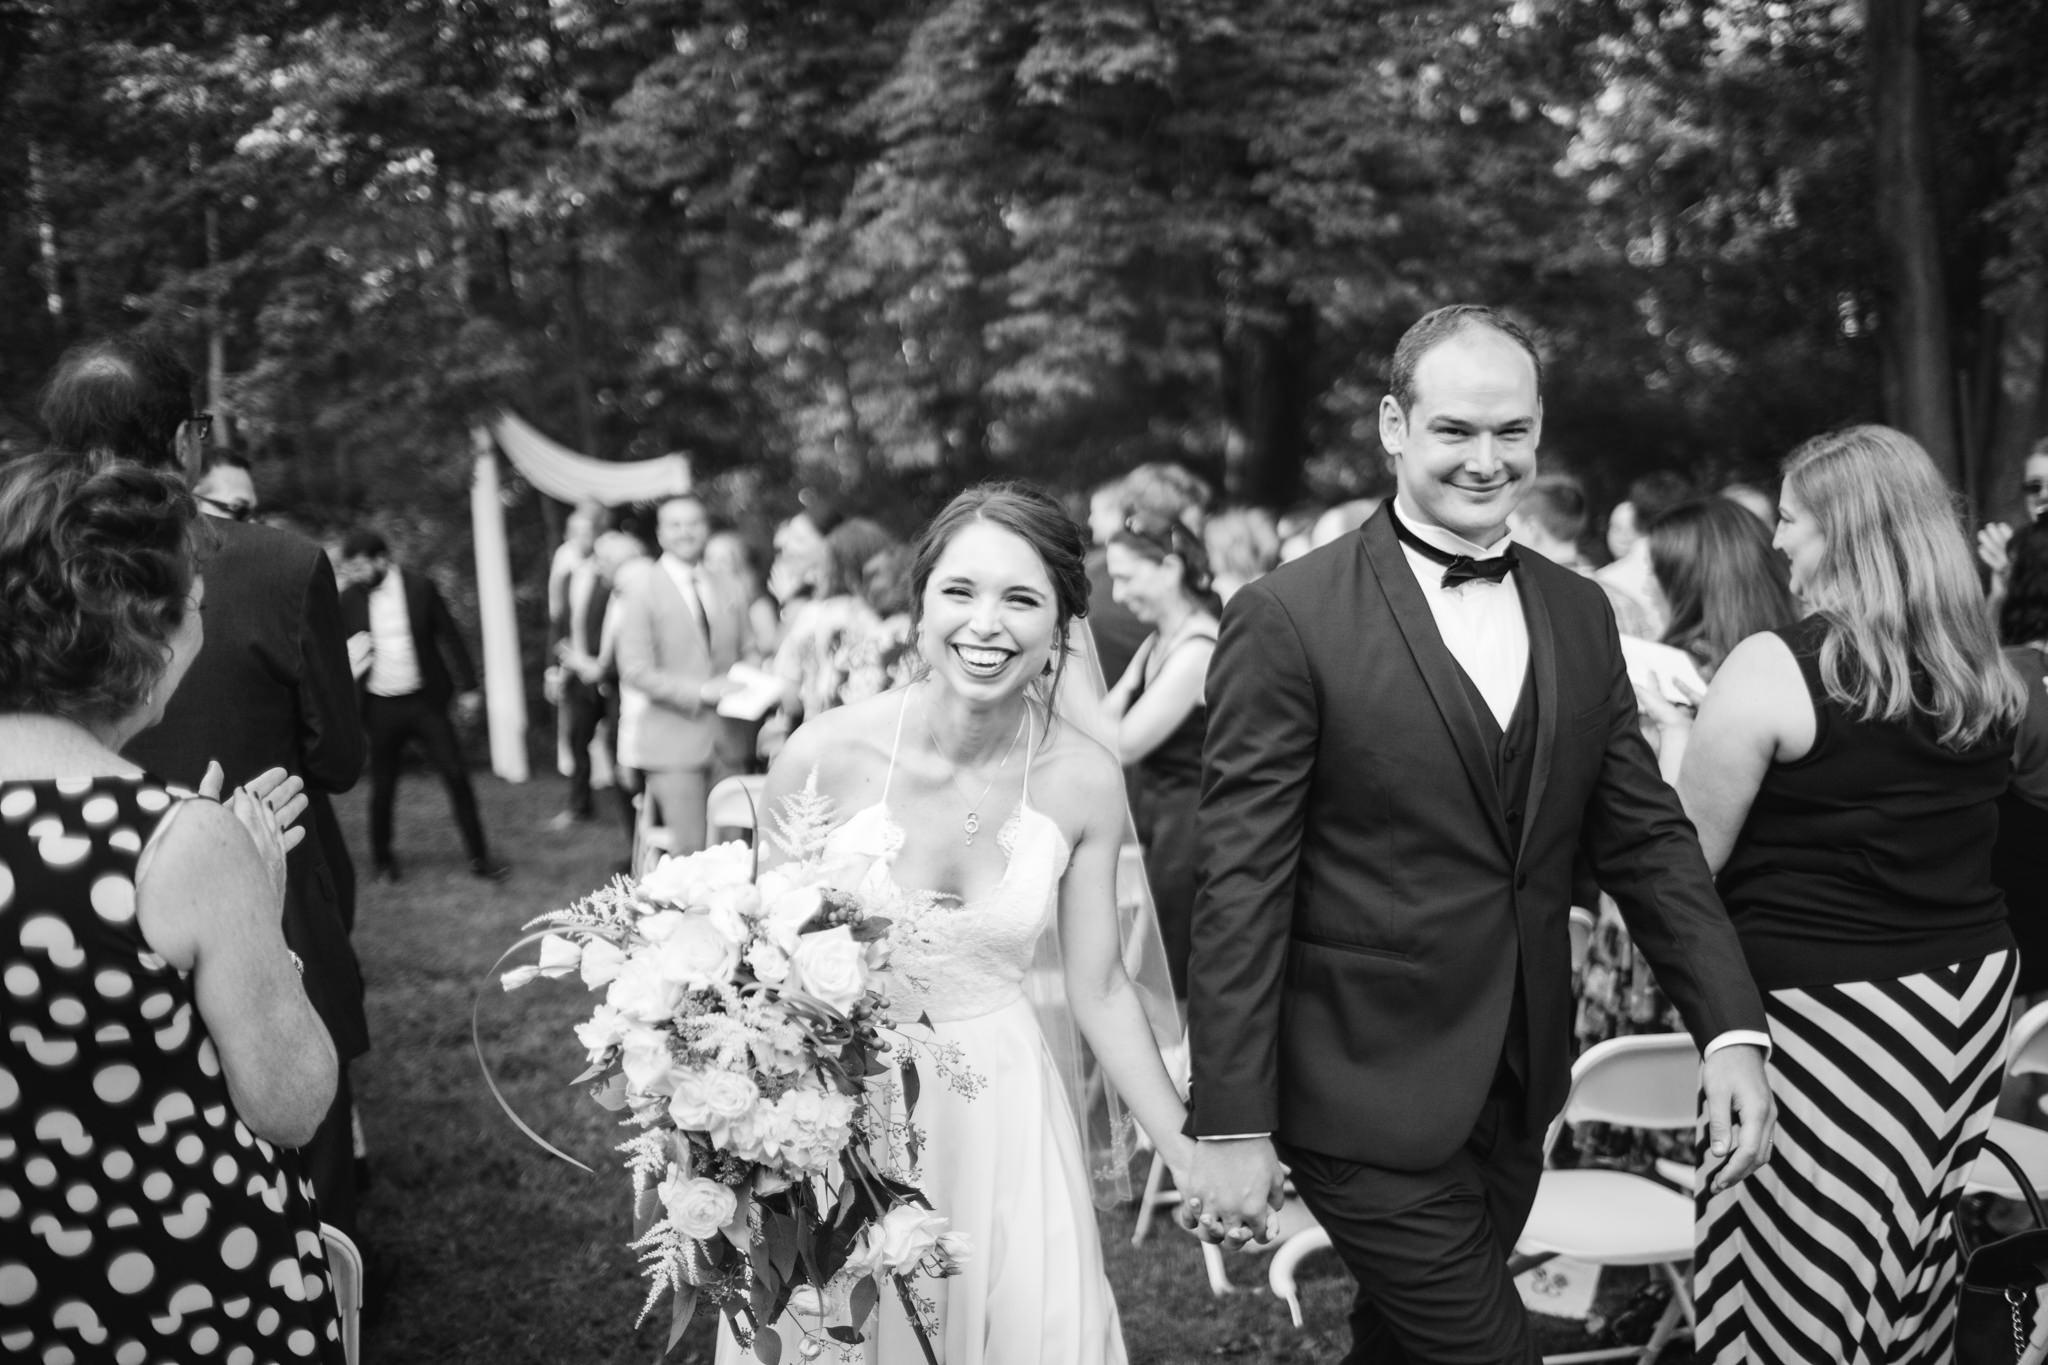 Jillian-rollins-photography-top100-capecodphotographer-maphotographer-wedding-photographer-newport-wedding-54.jpg